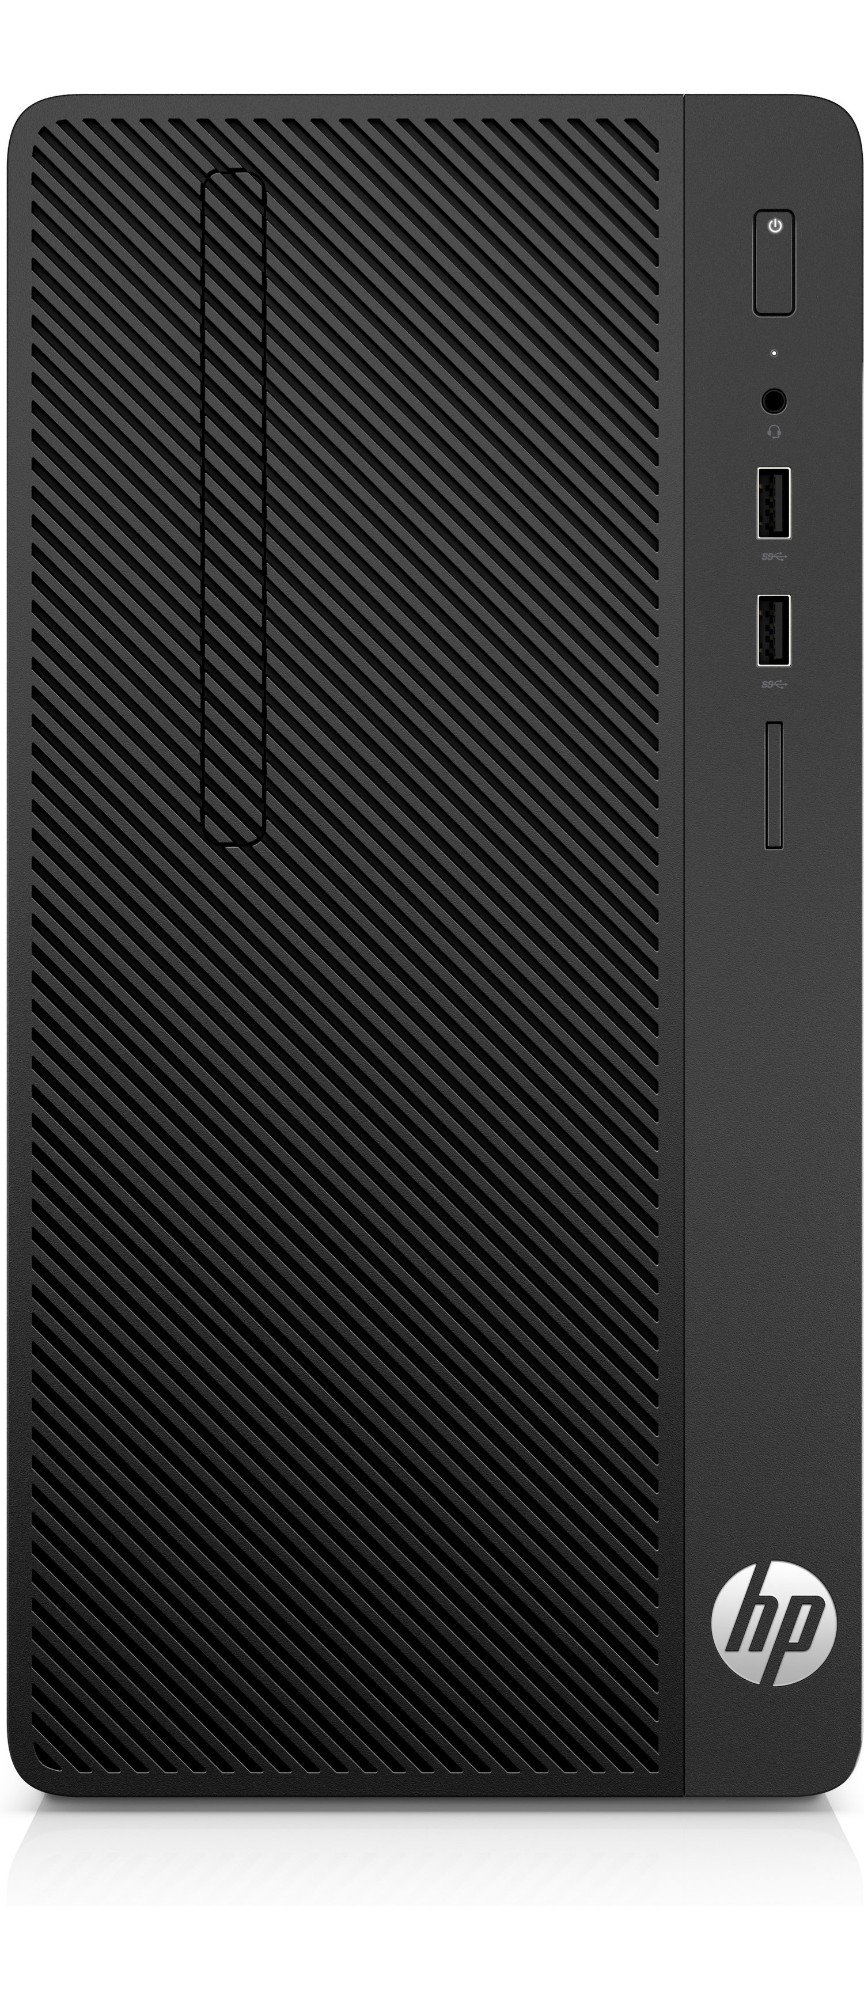 HP 285 G3 AMD Ryzen 5 2400G 8 GB DDR4-SDRAM 256 GB SSD Black Micro Tower PC